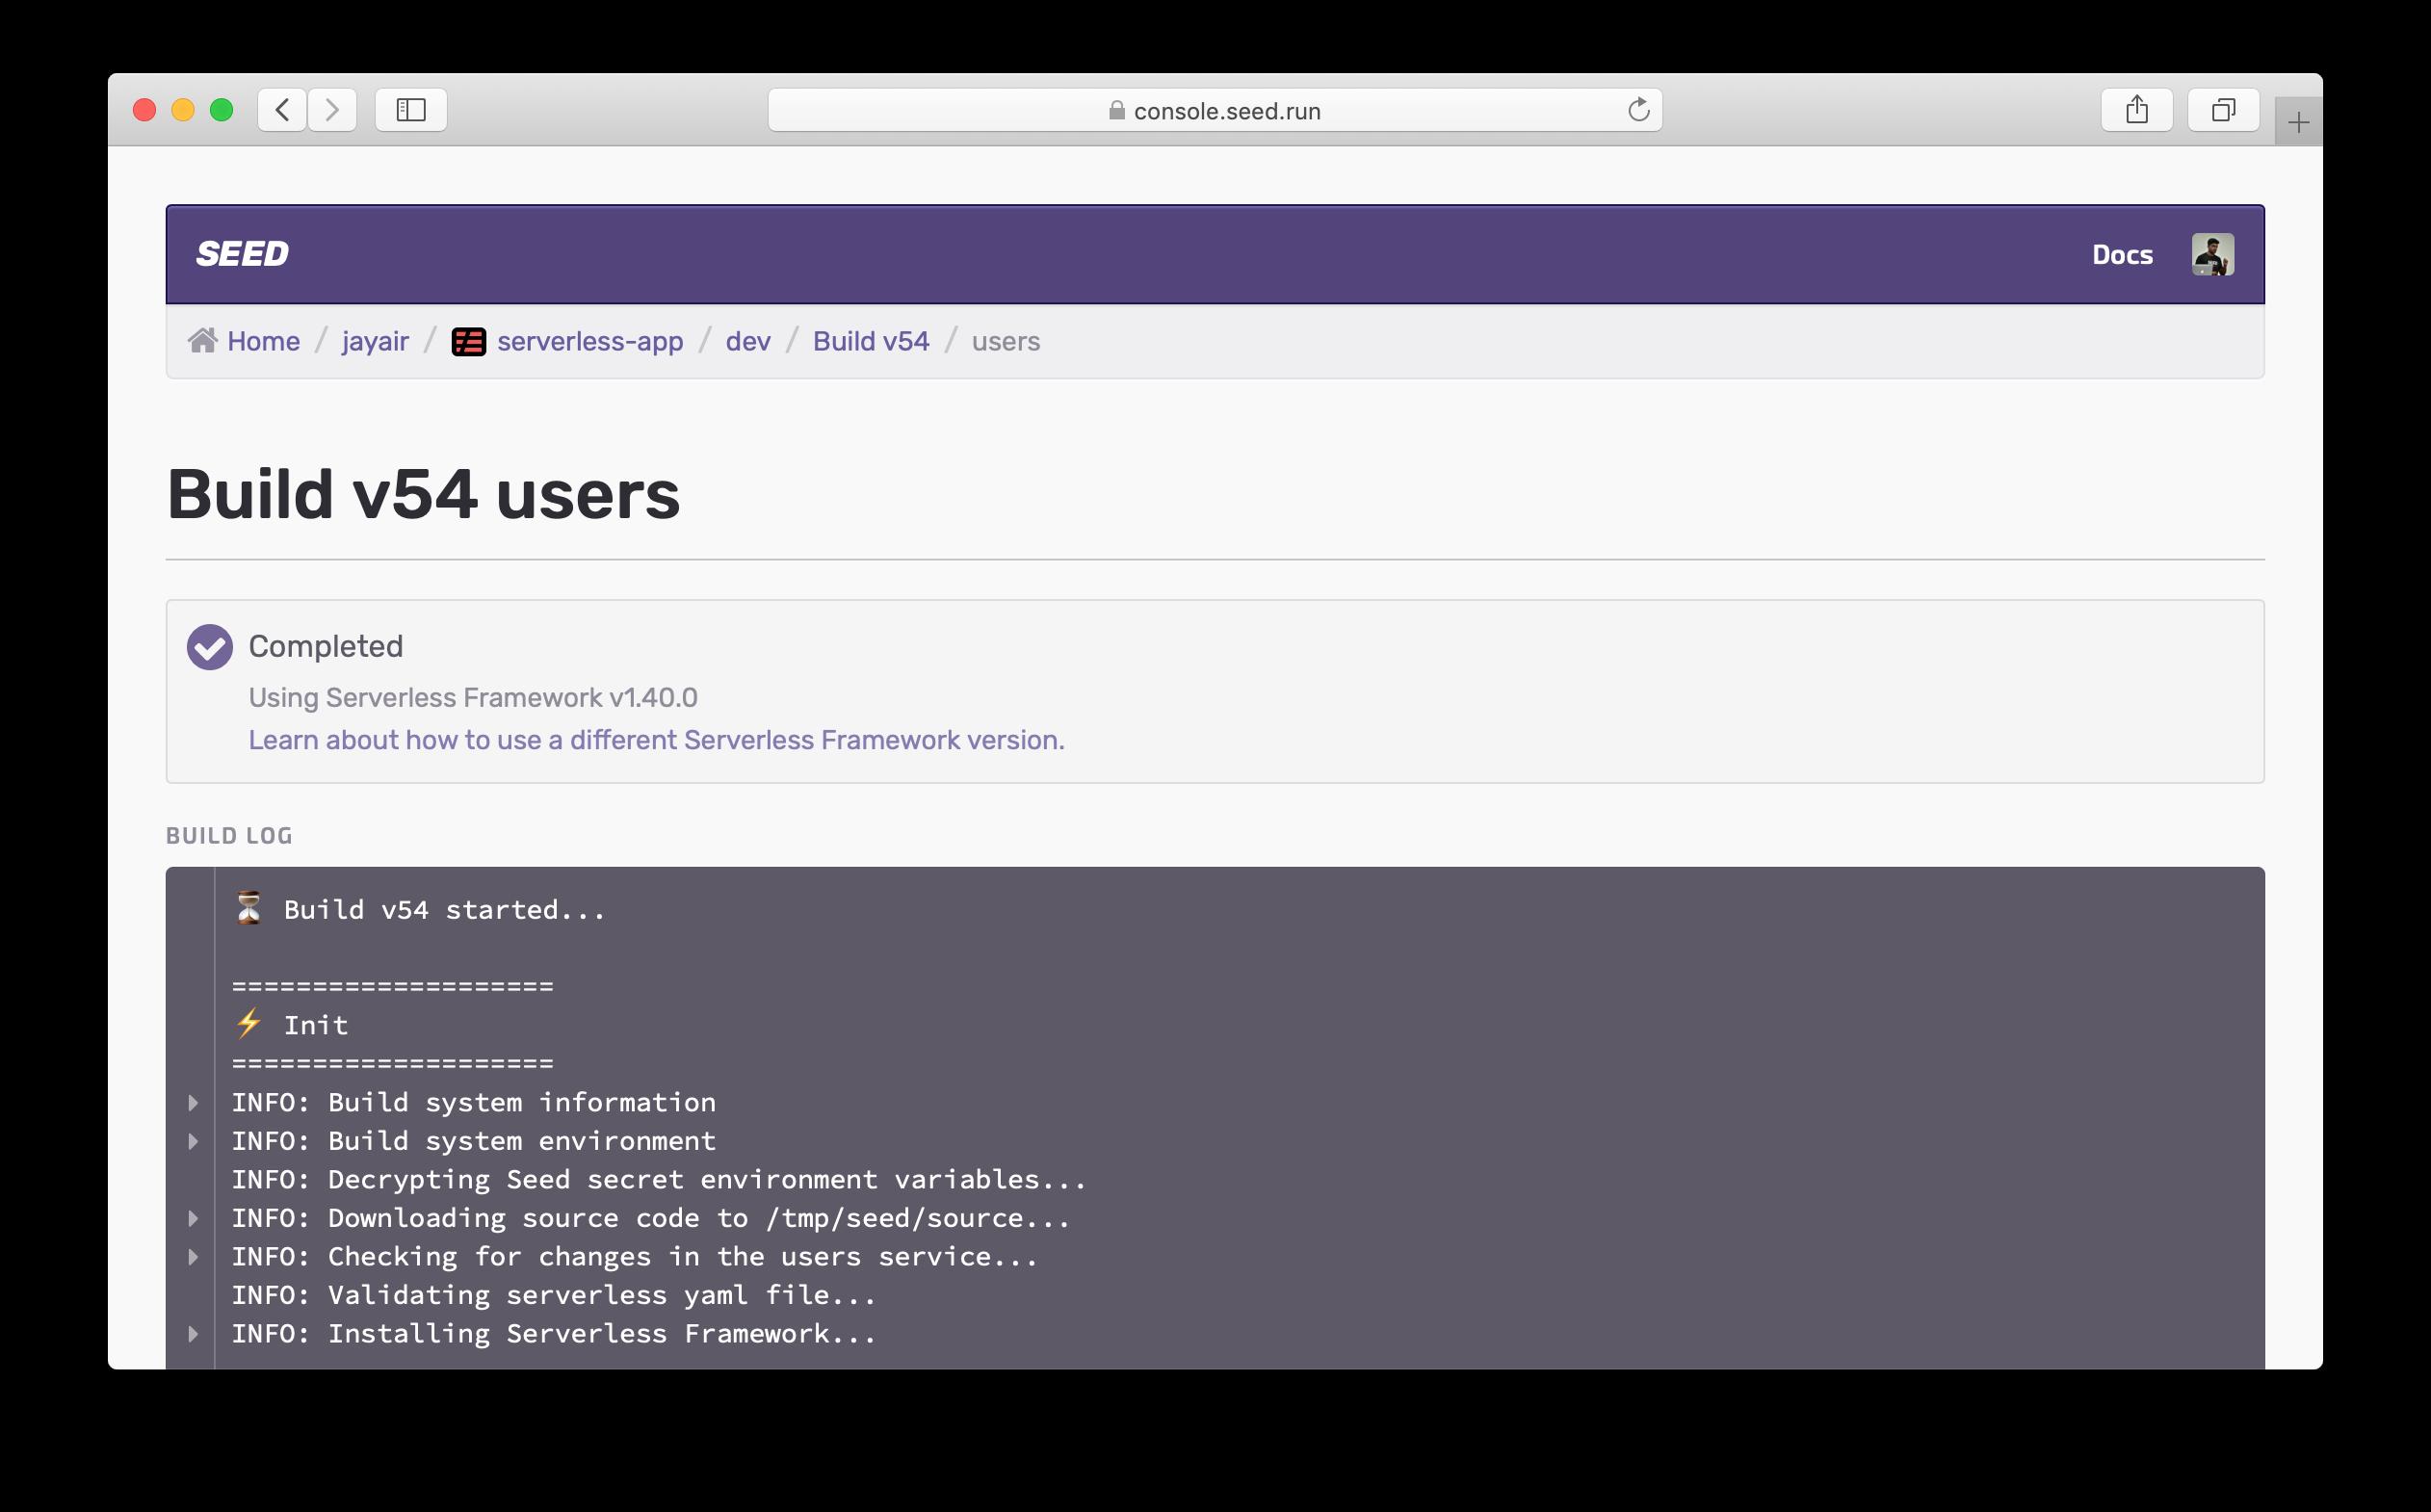 Serverless Framework version in build log